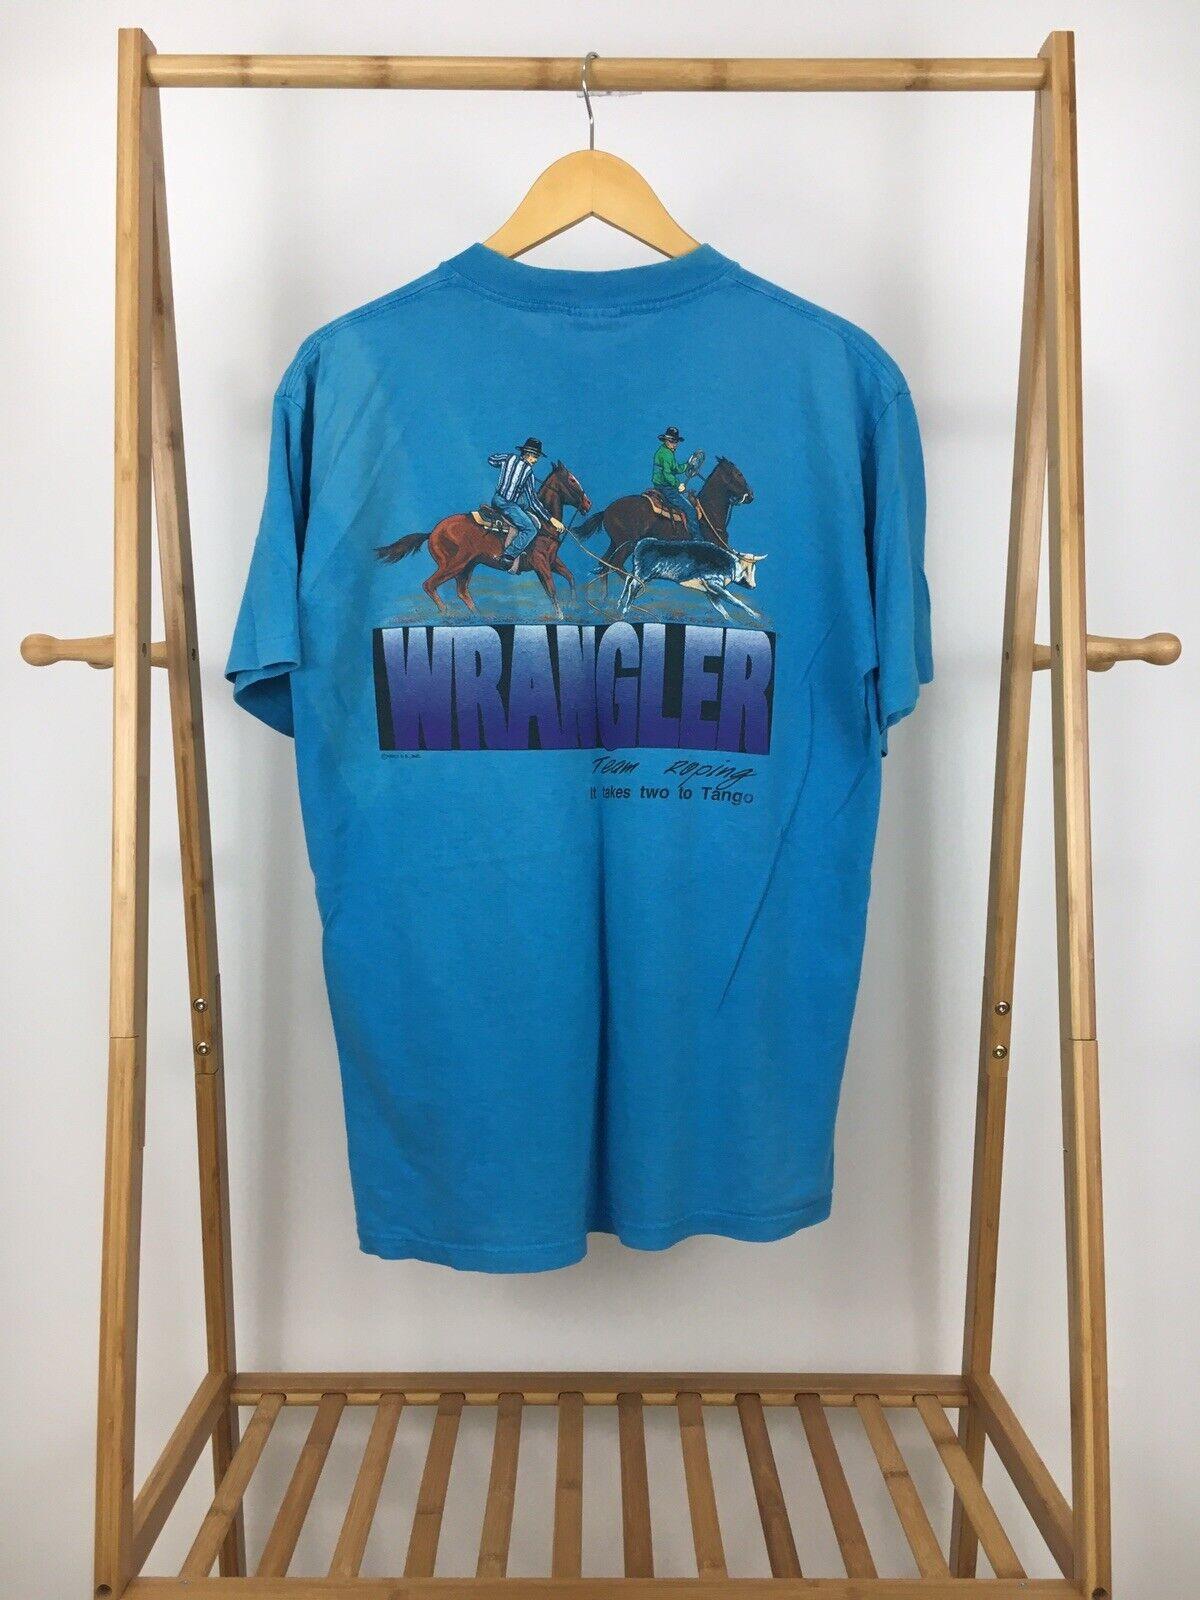 VTG 1993 Wrangler Men's Team Racing It Takes Two To Tango Short Sleeve T-Shirt L